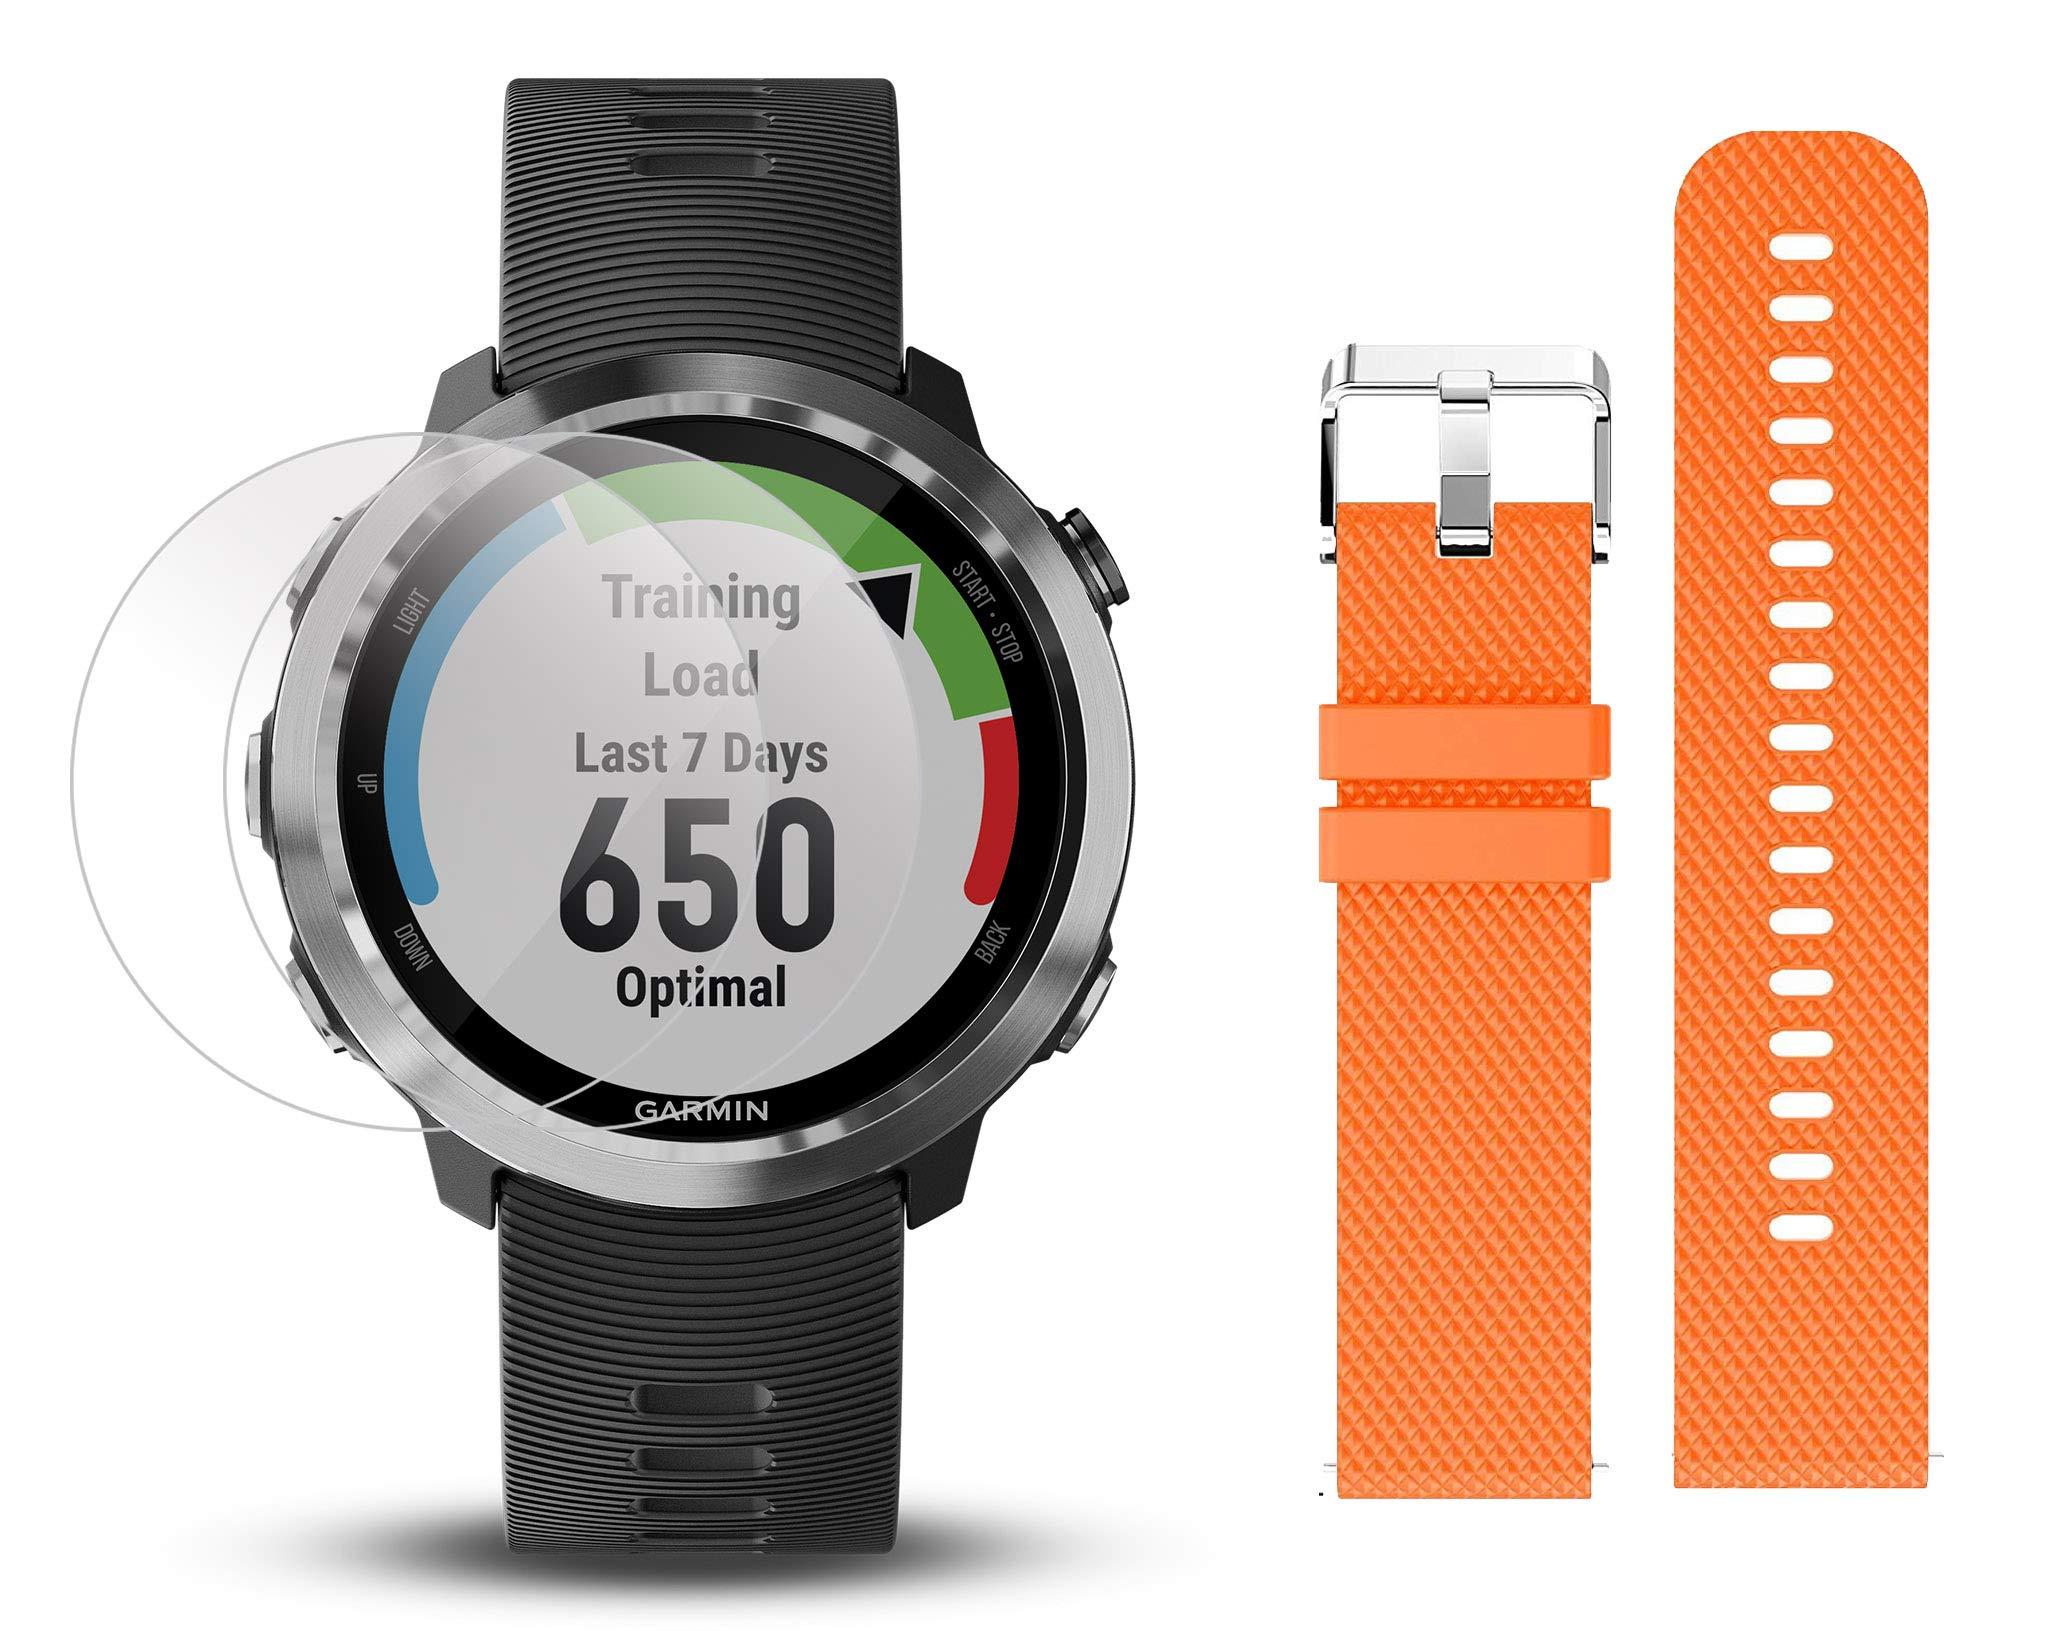 Garmin Forerunner 645 Bundle with Extra Band & HD Screen Protector Film (x4) | Running GPS Watch, Wrist HR, LiveTrack, Garmin Pay (Stainless, Orange)